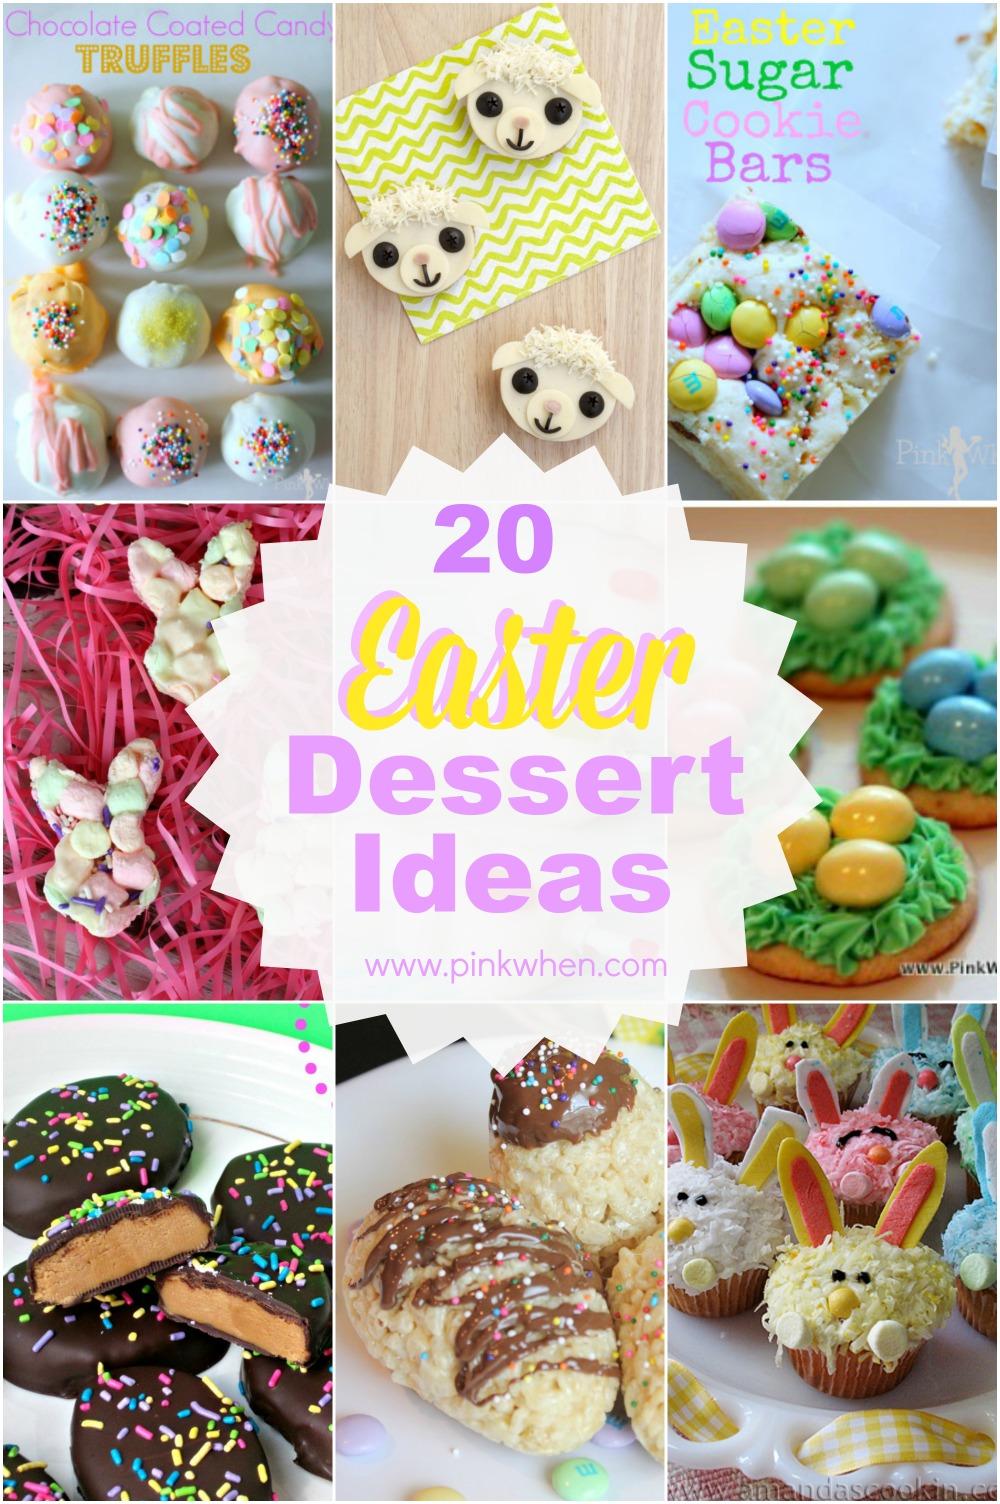 20 Easter Dessert Ideas via @PinkWhen www.pinkwhen.com